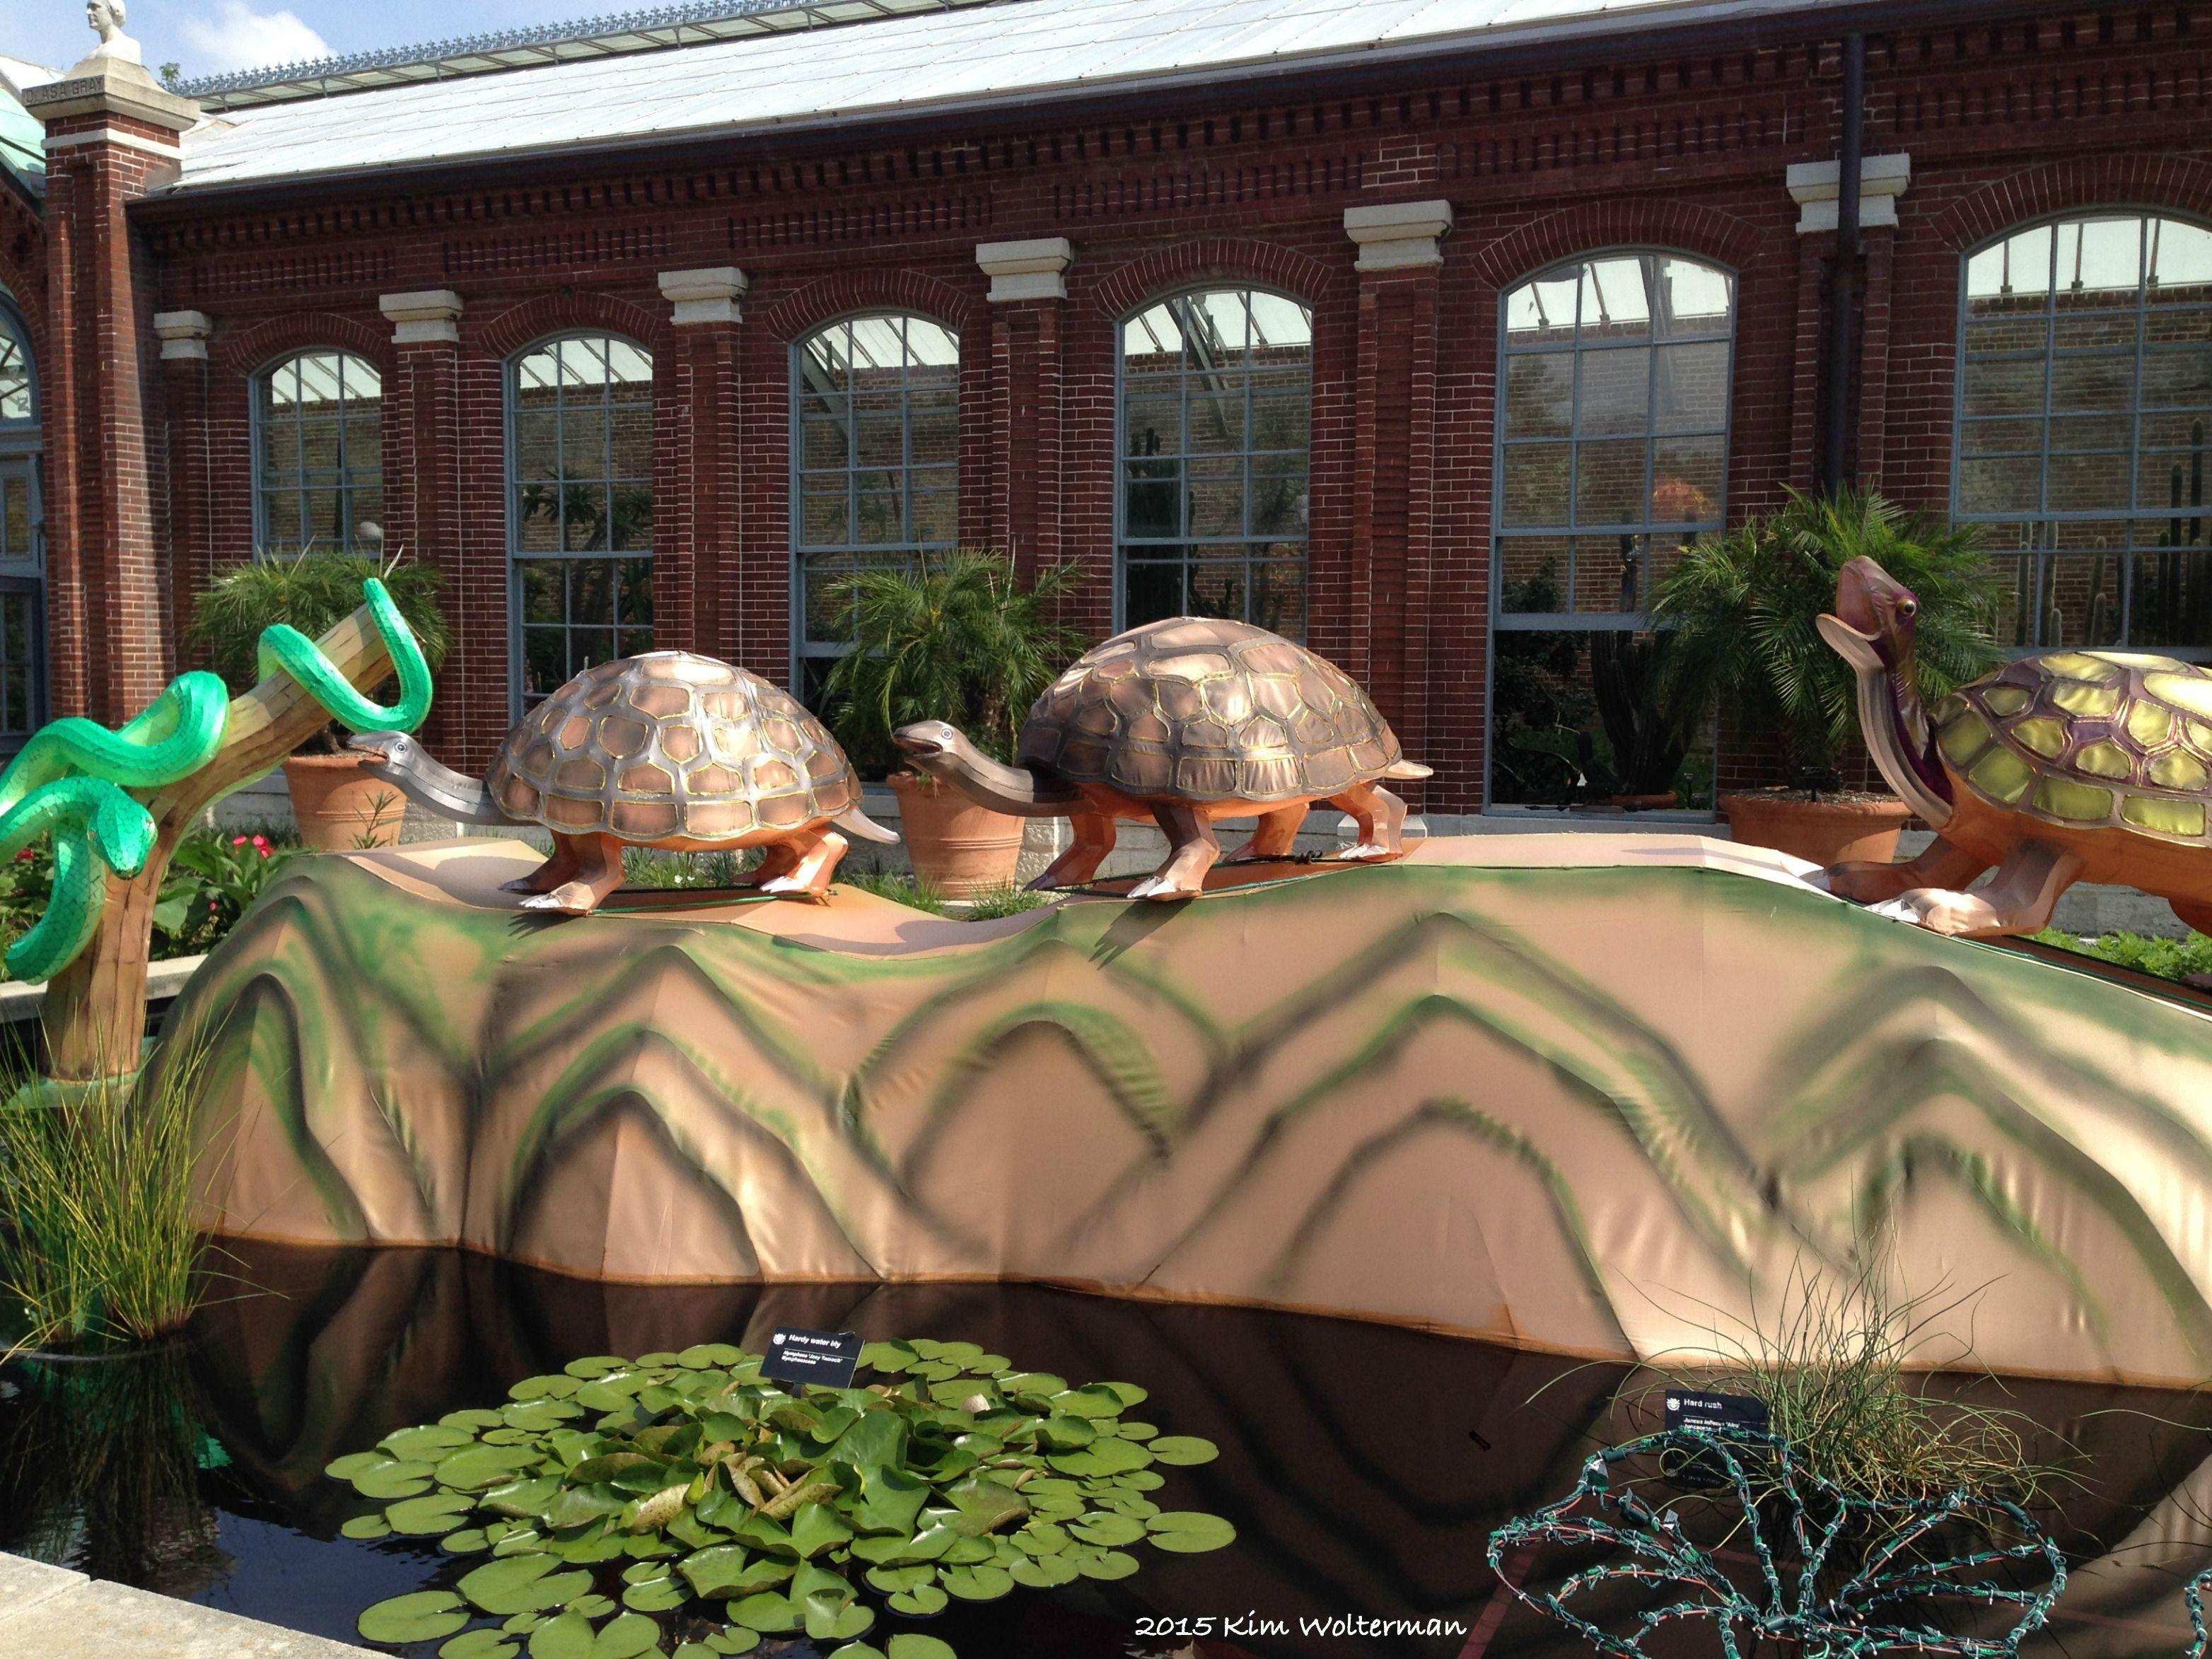 Wetland Wonders lantern view 2 at the Missouri Botanical Garden ...